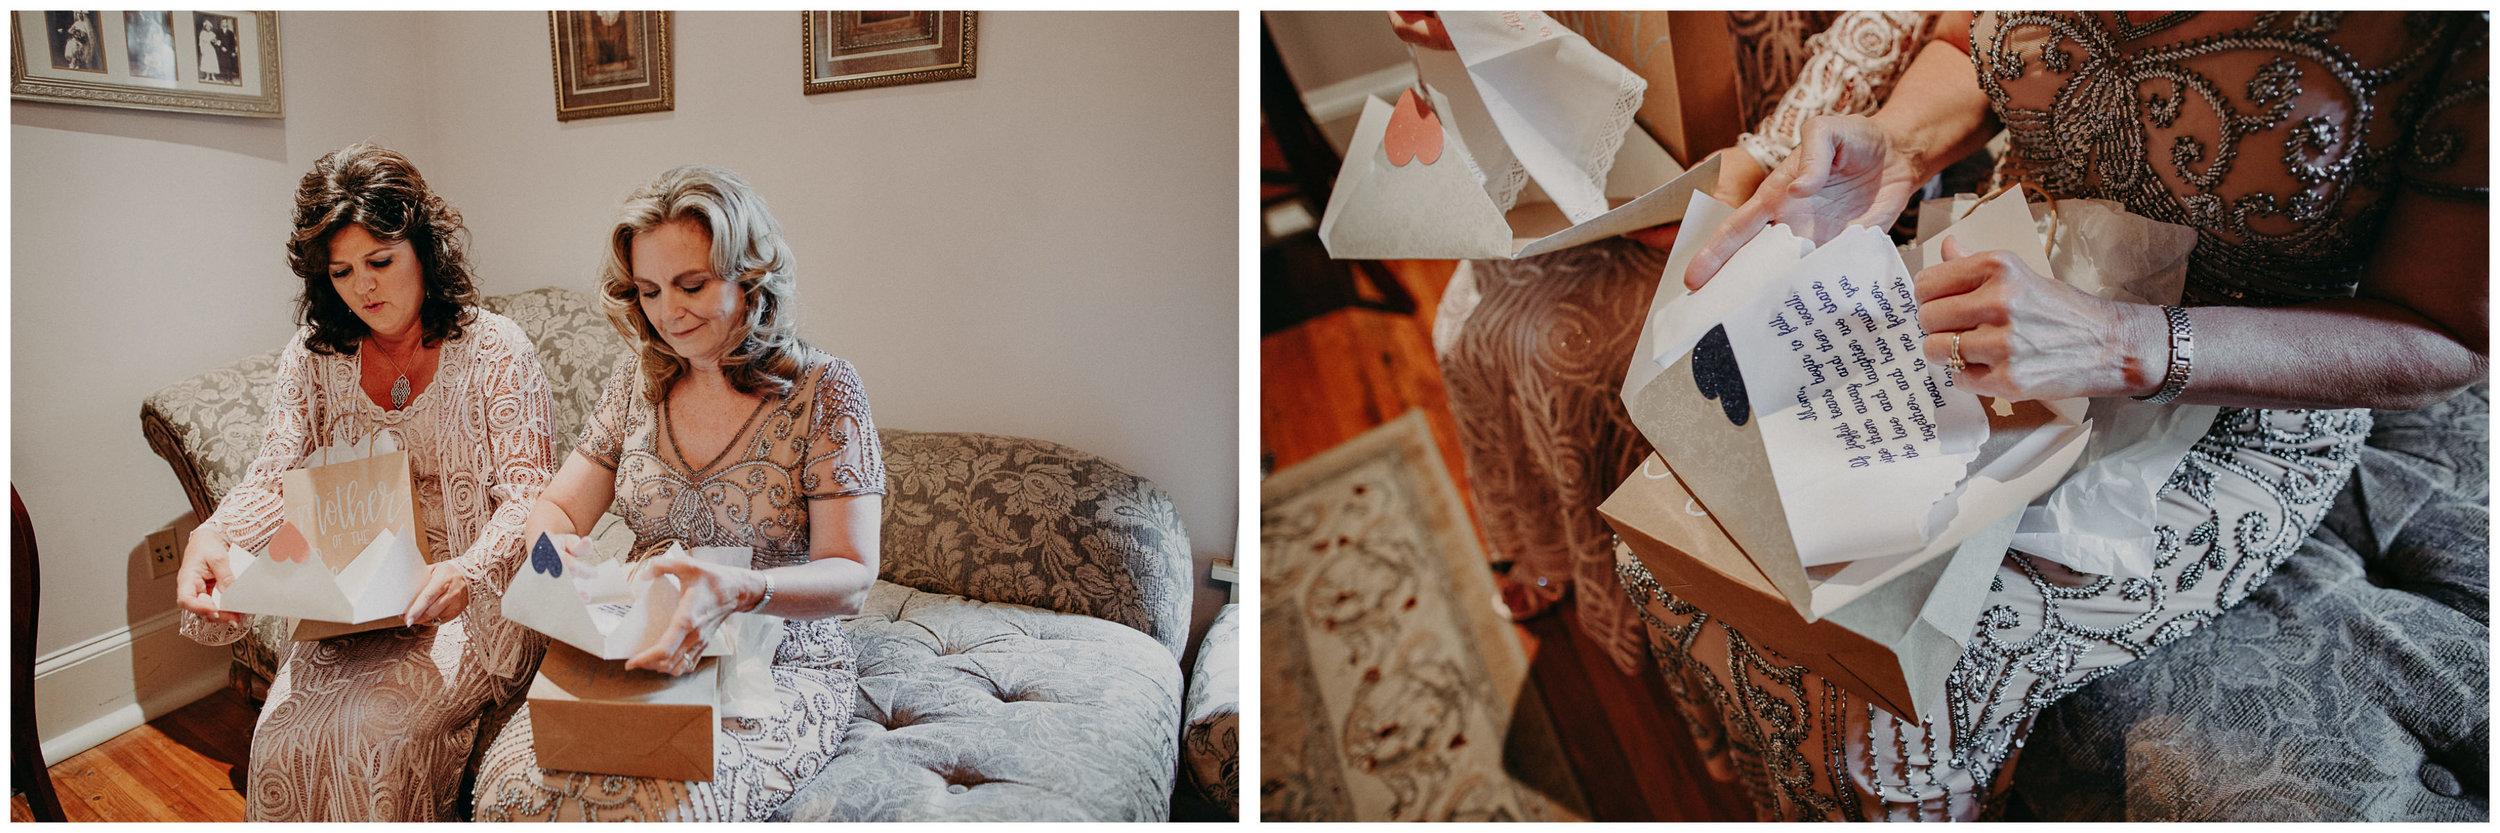 13Carl House Wedding Venue Ga, Atlanta Wedding Photographer - Boho, Bohemian, Junebug Weddings, Vintage, Retro, Trendy. Aline Marin Photography. .jpg